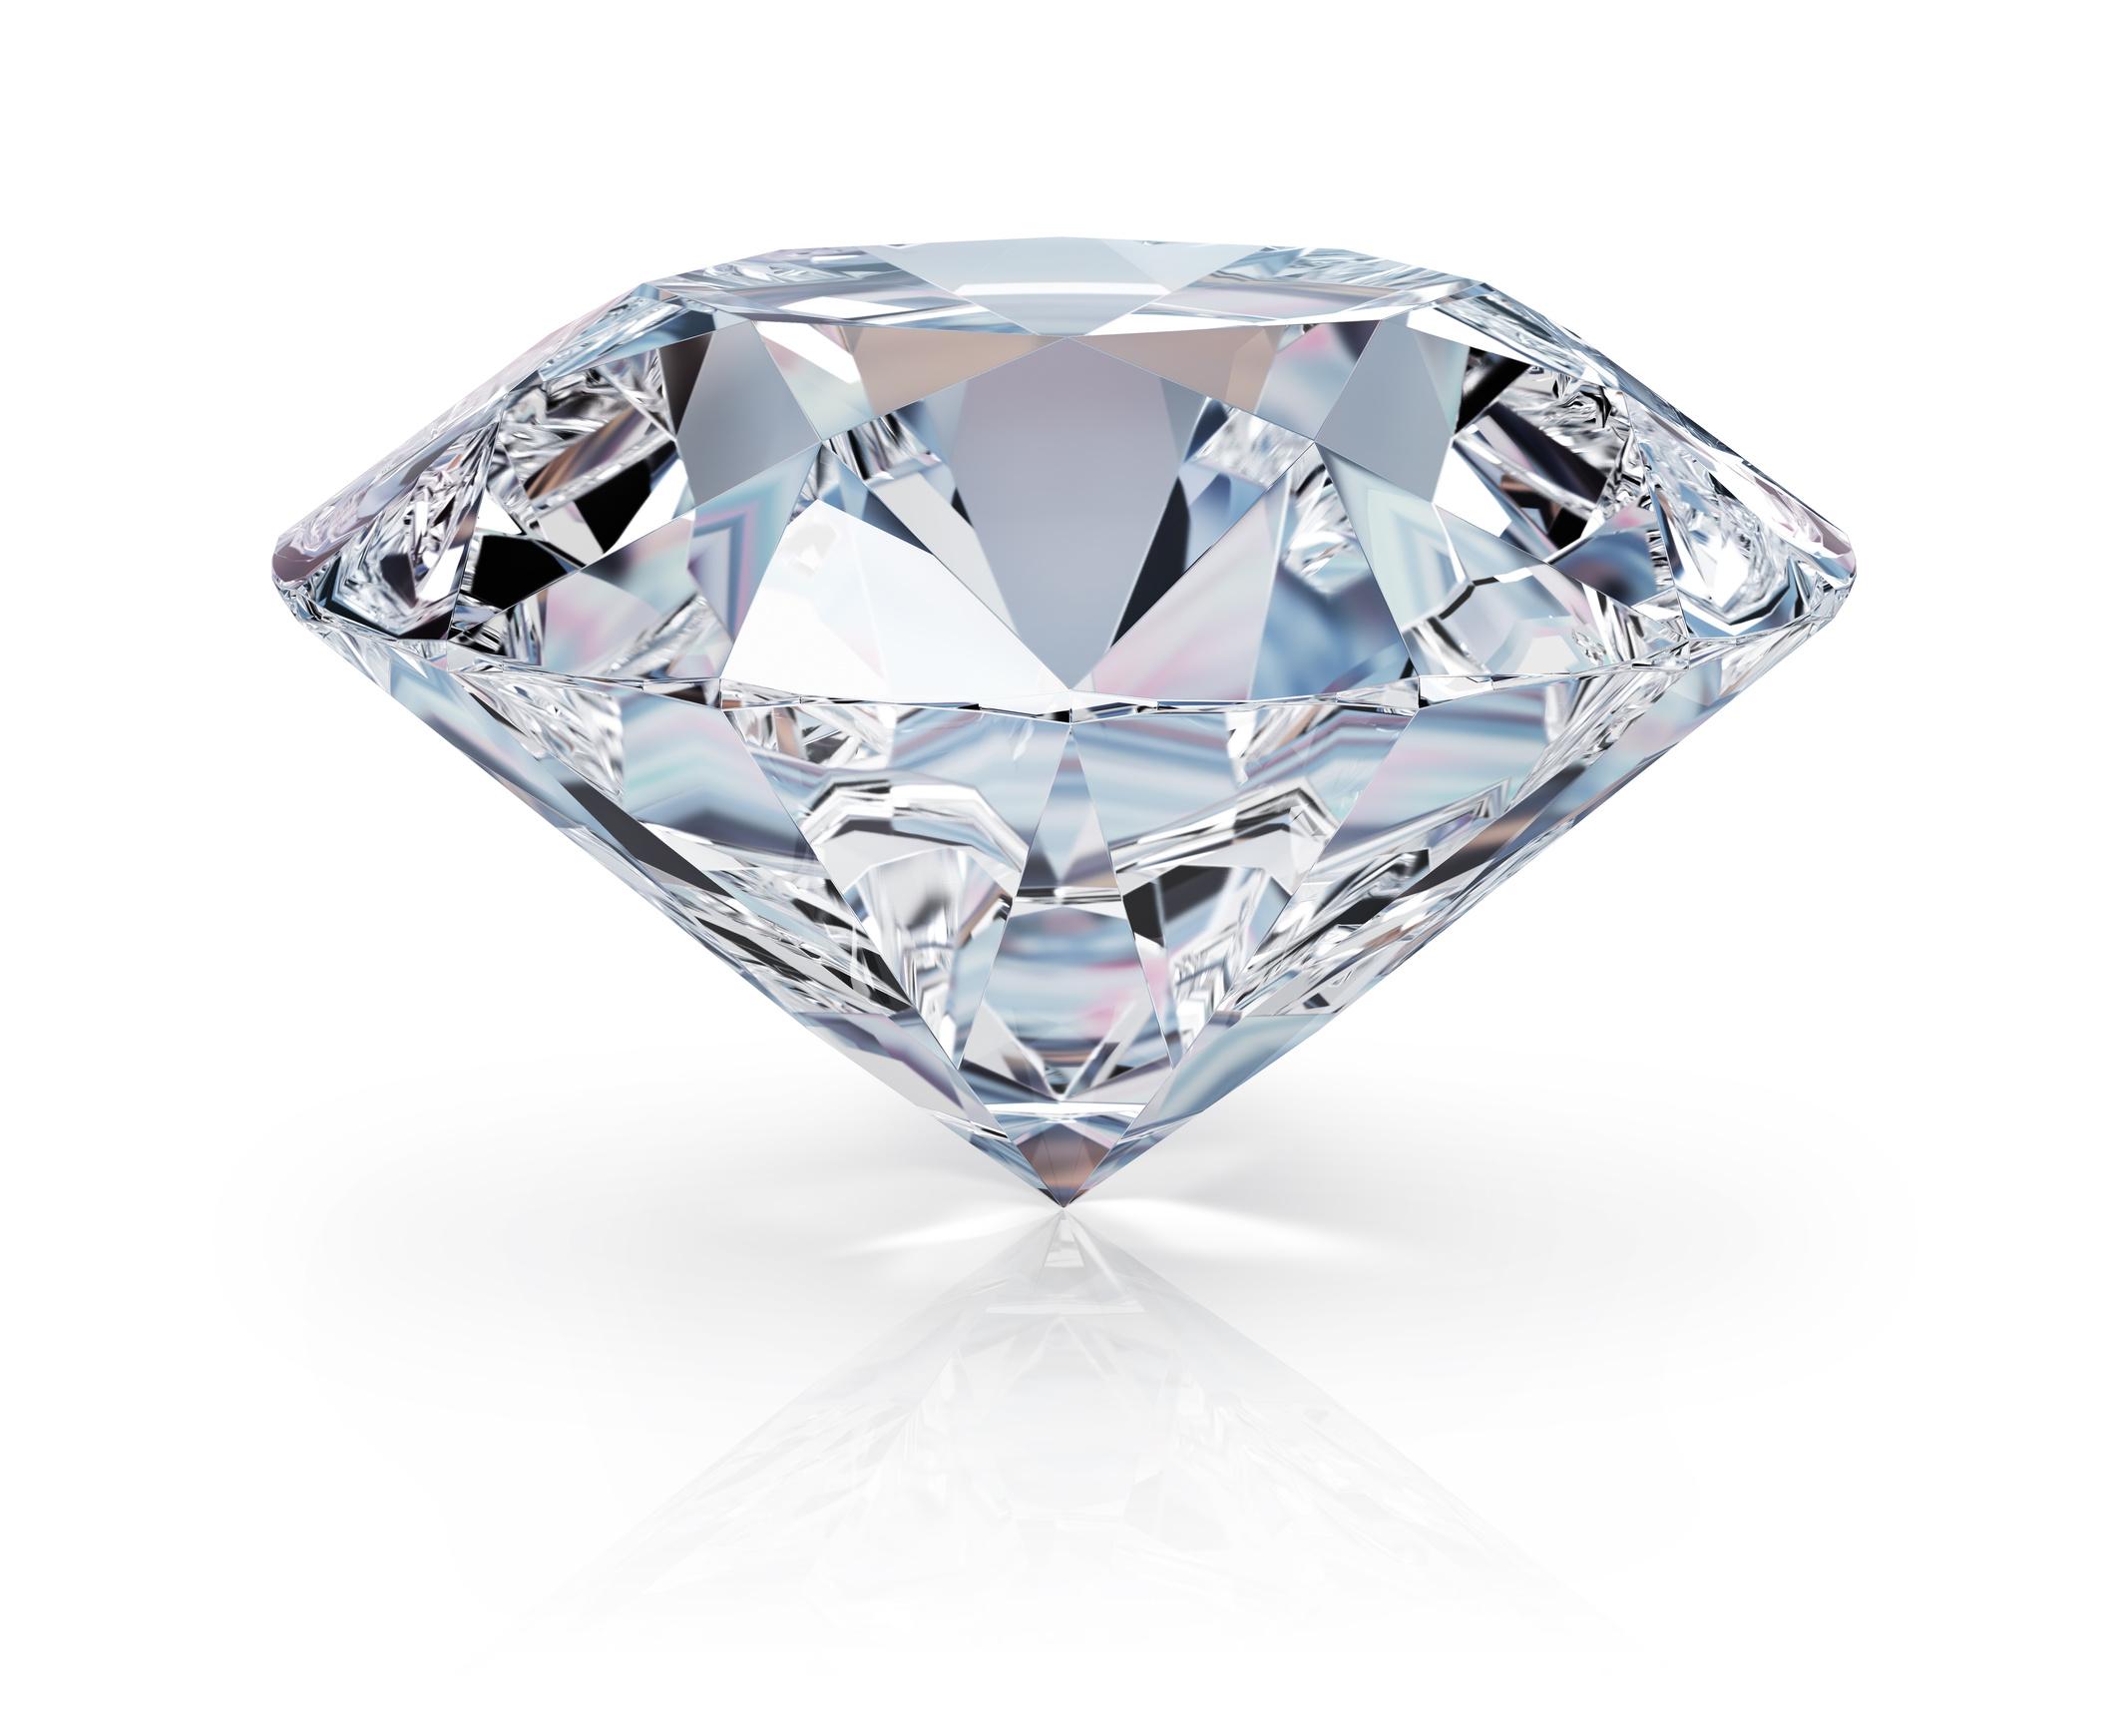 Diamond Png image #26575 - Diamond PNG